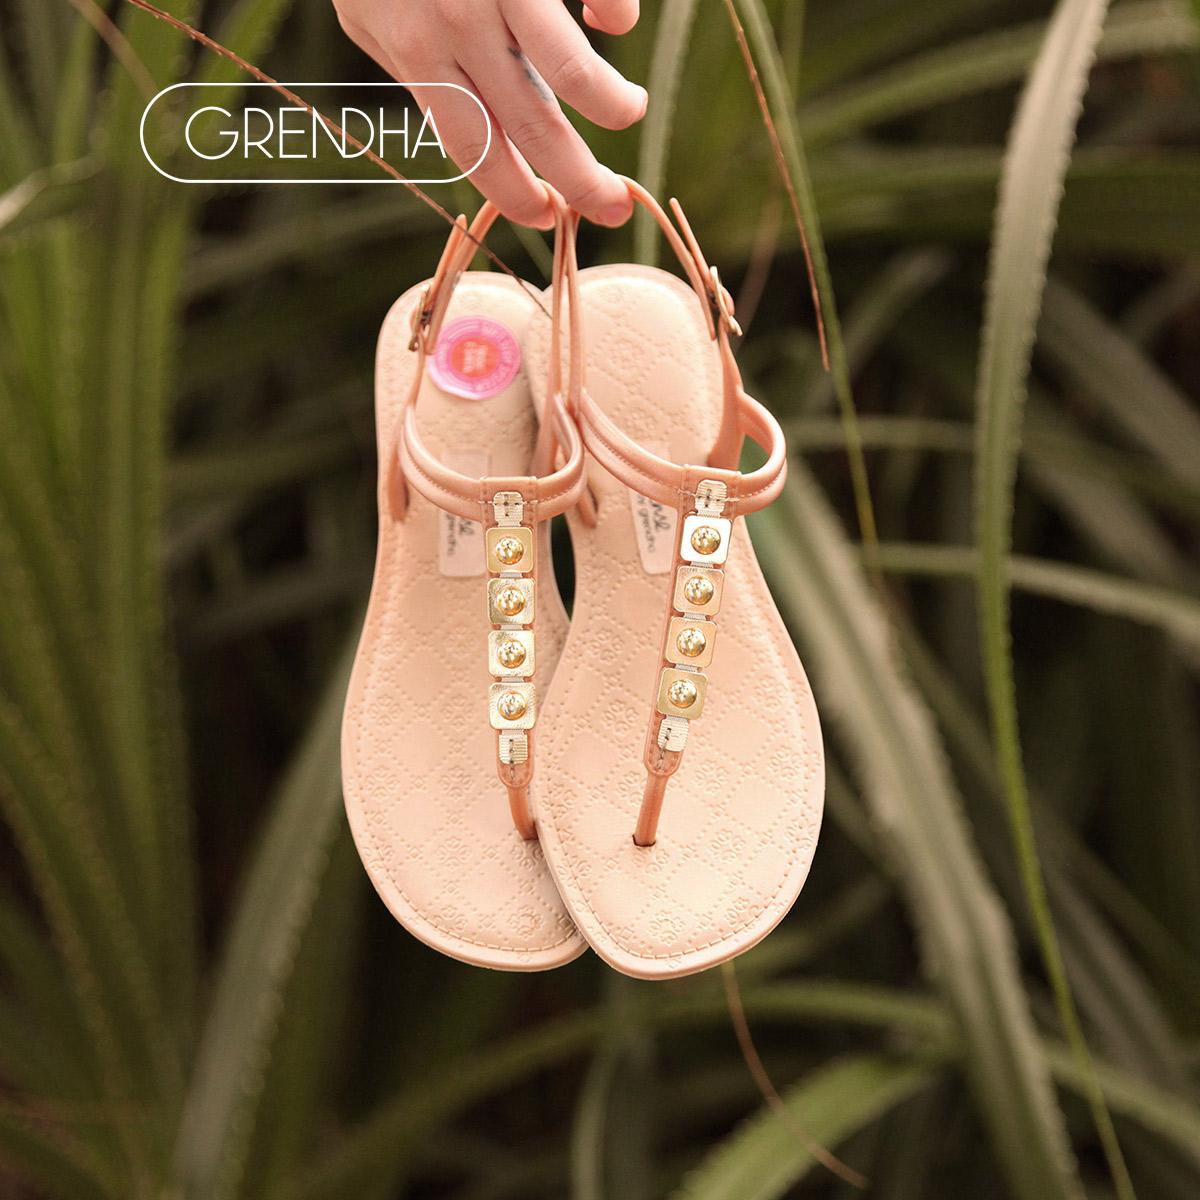 GRENDHA感官不累脚系列夏季浅棕平底时尚通勤罗马沙滩夹趾鞋女士